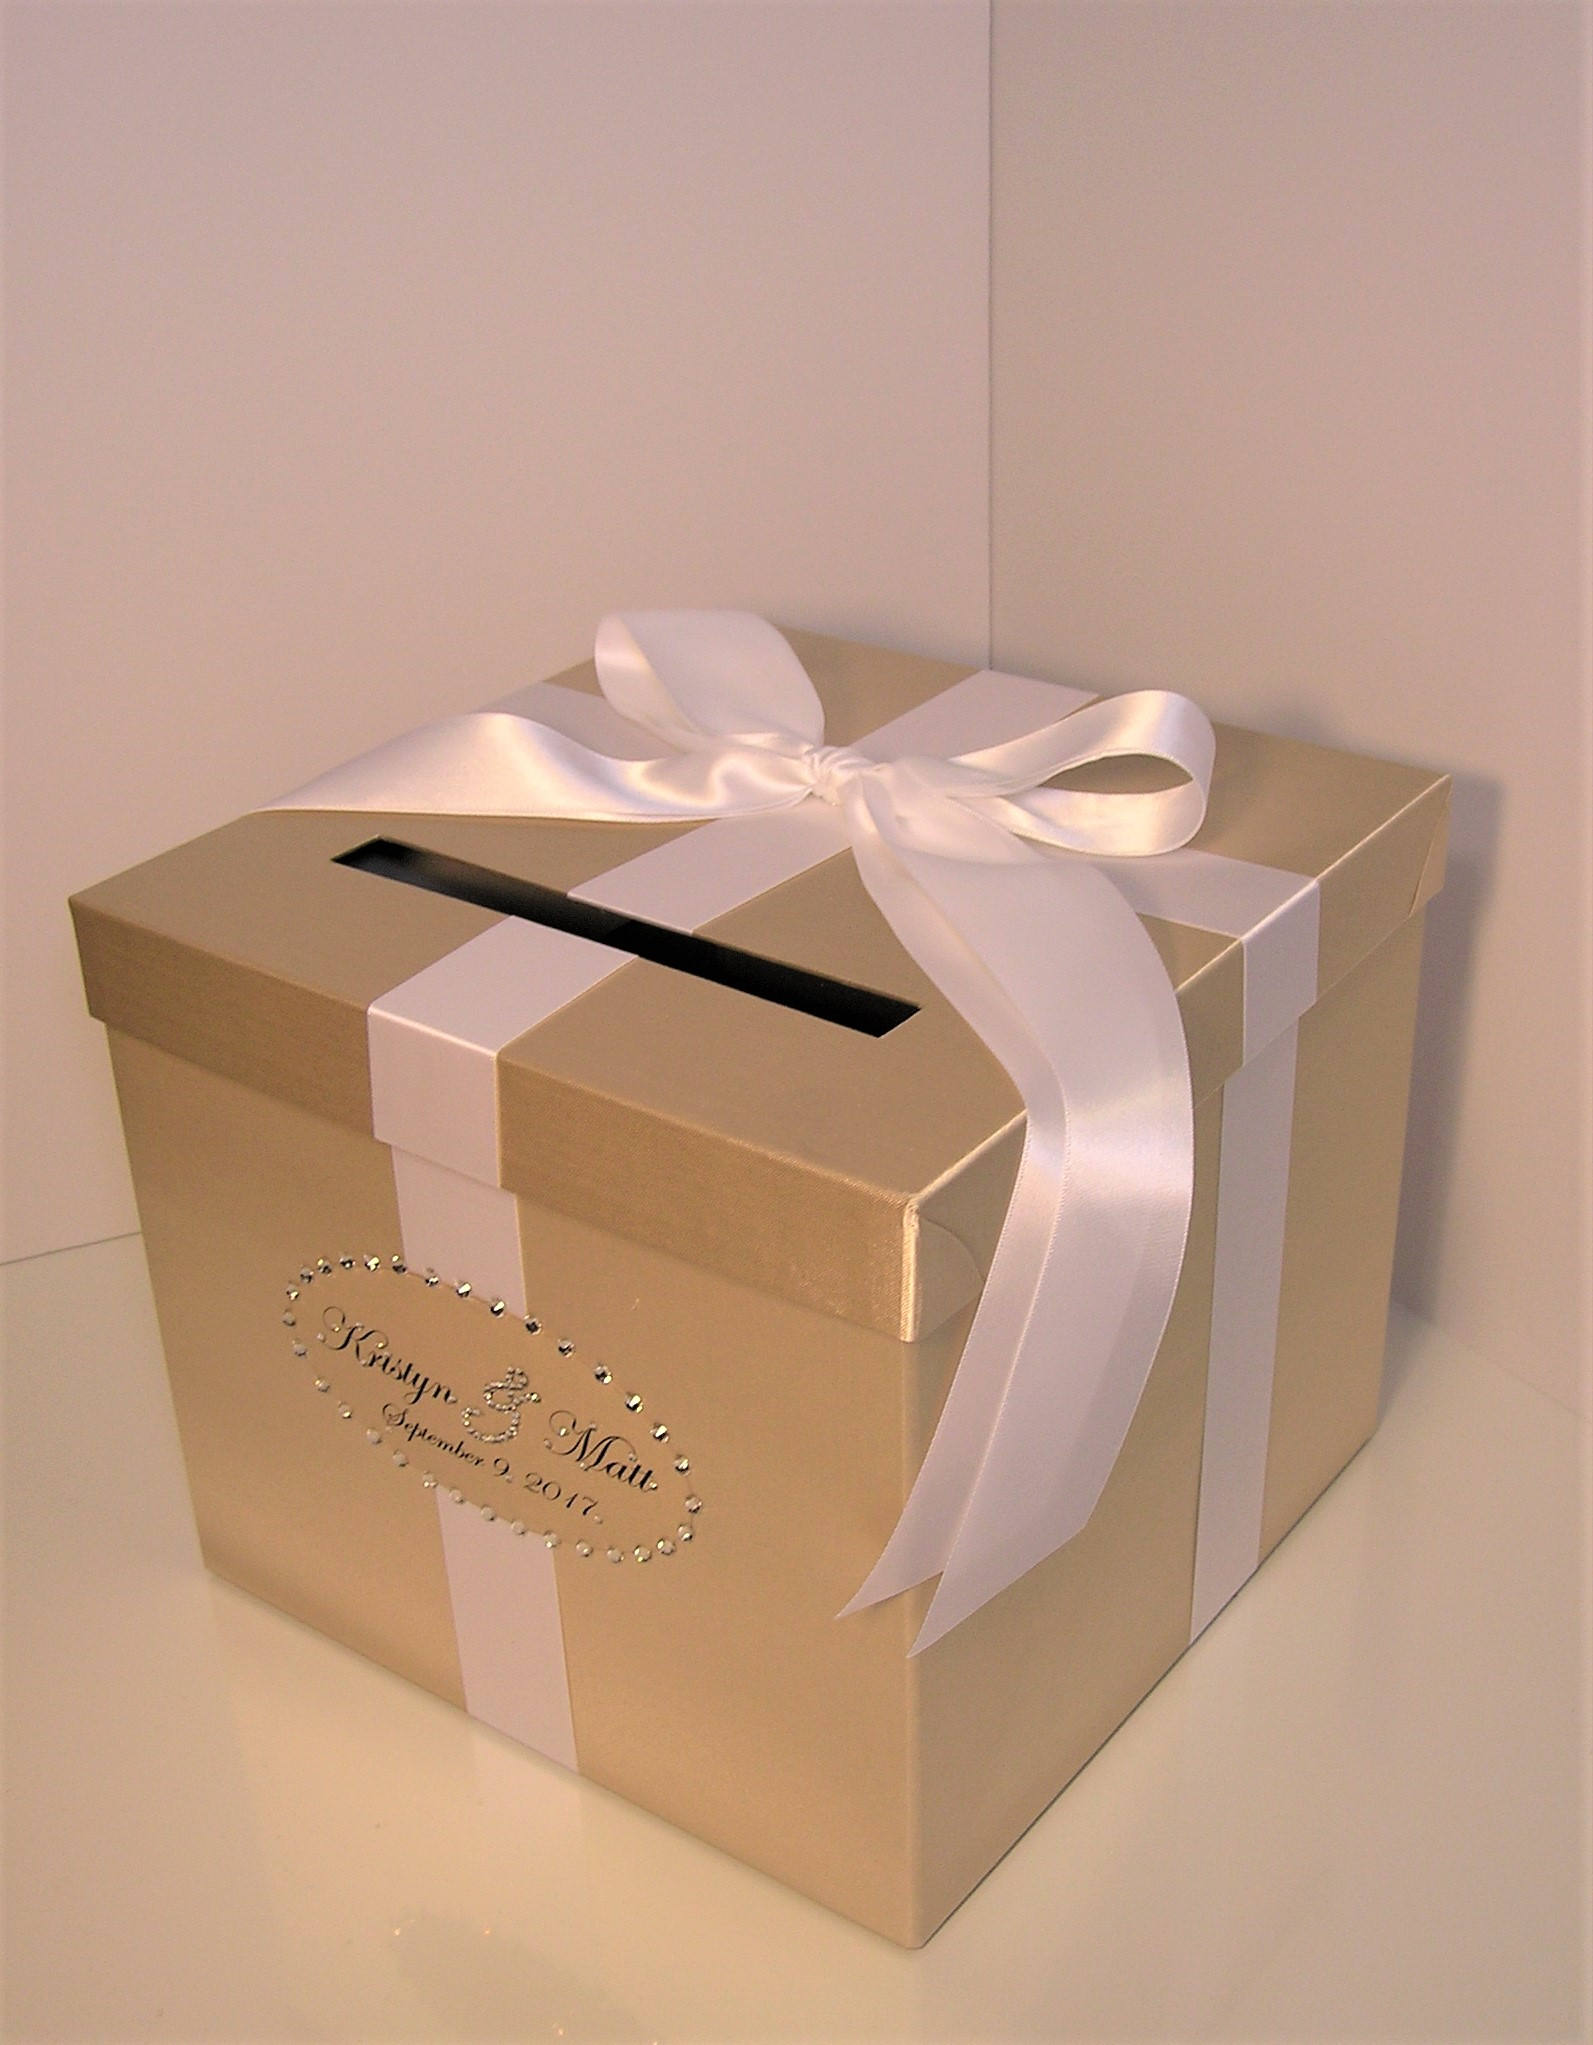 Wedding Card Box Champagne and White Gift Card Box Money Box